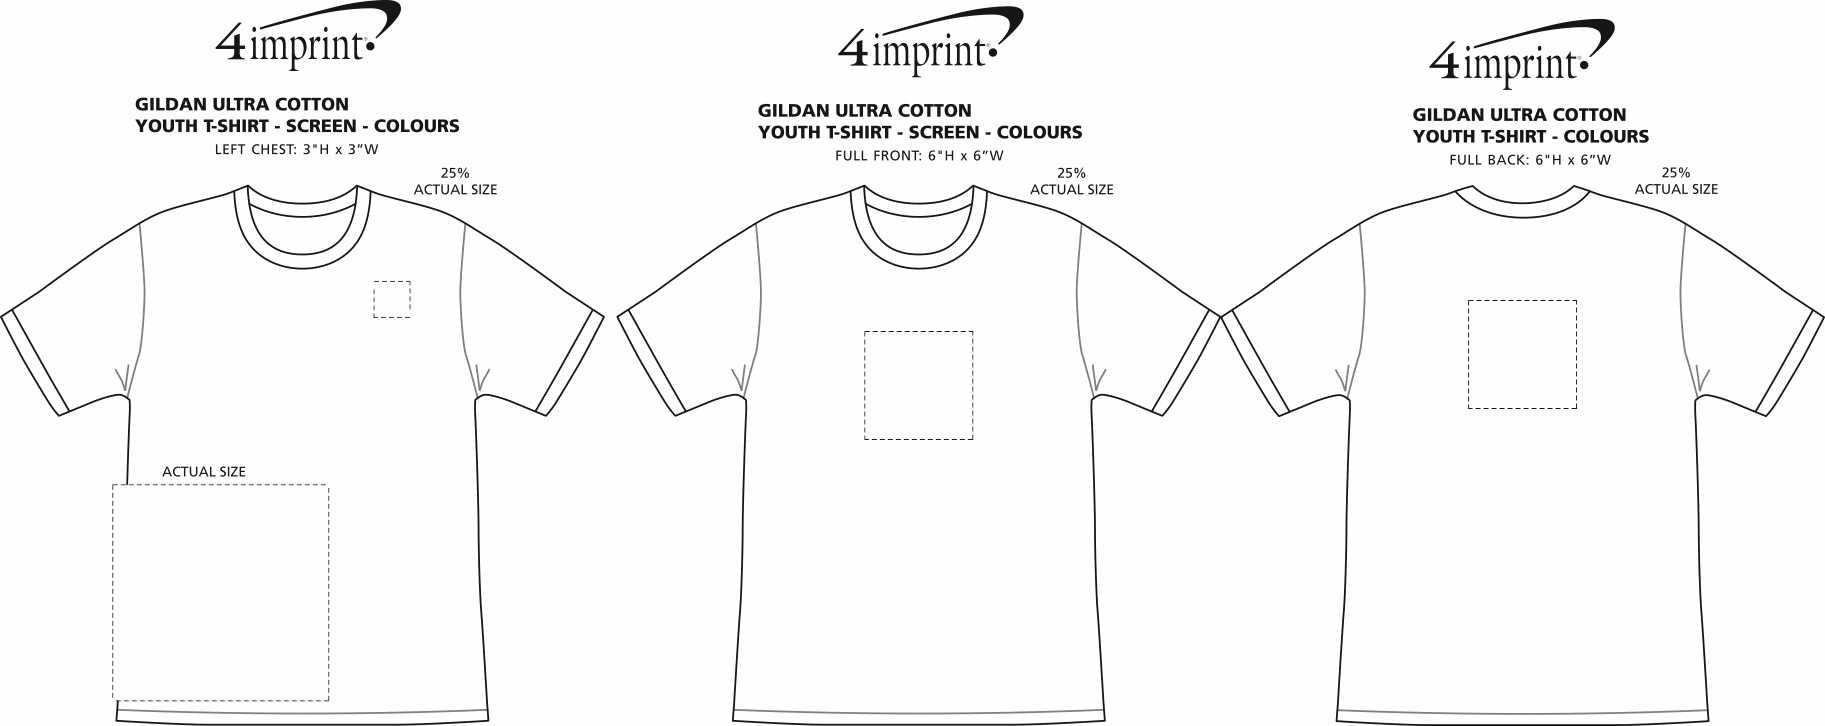 Imprint Area of Gildan Ultra Cotton T-shirt - Youth - Screen - Colours